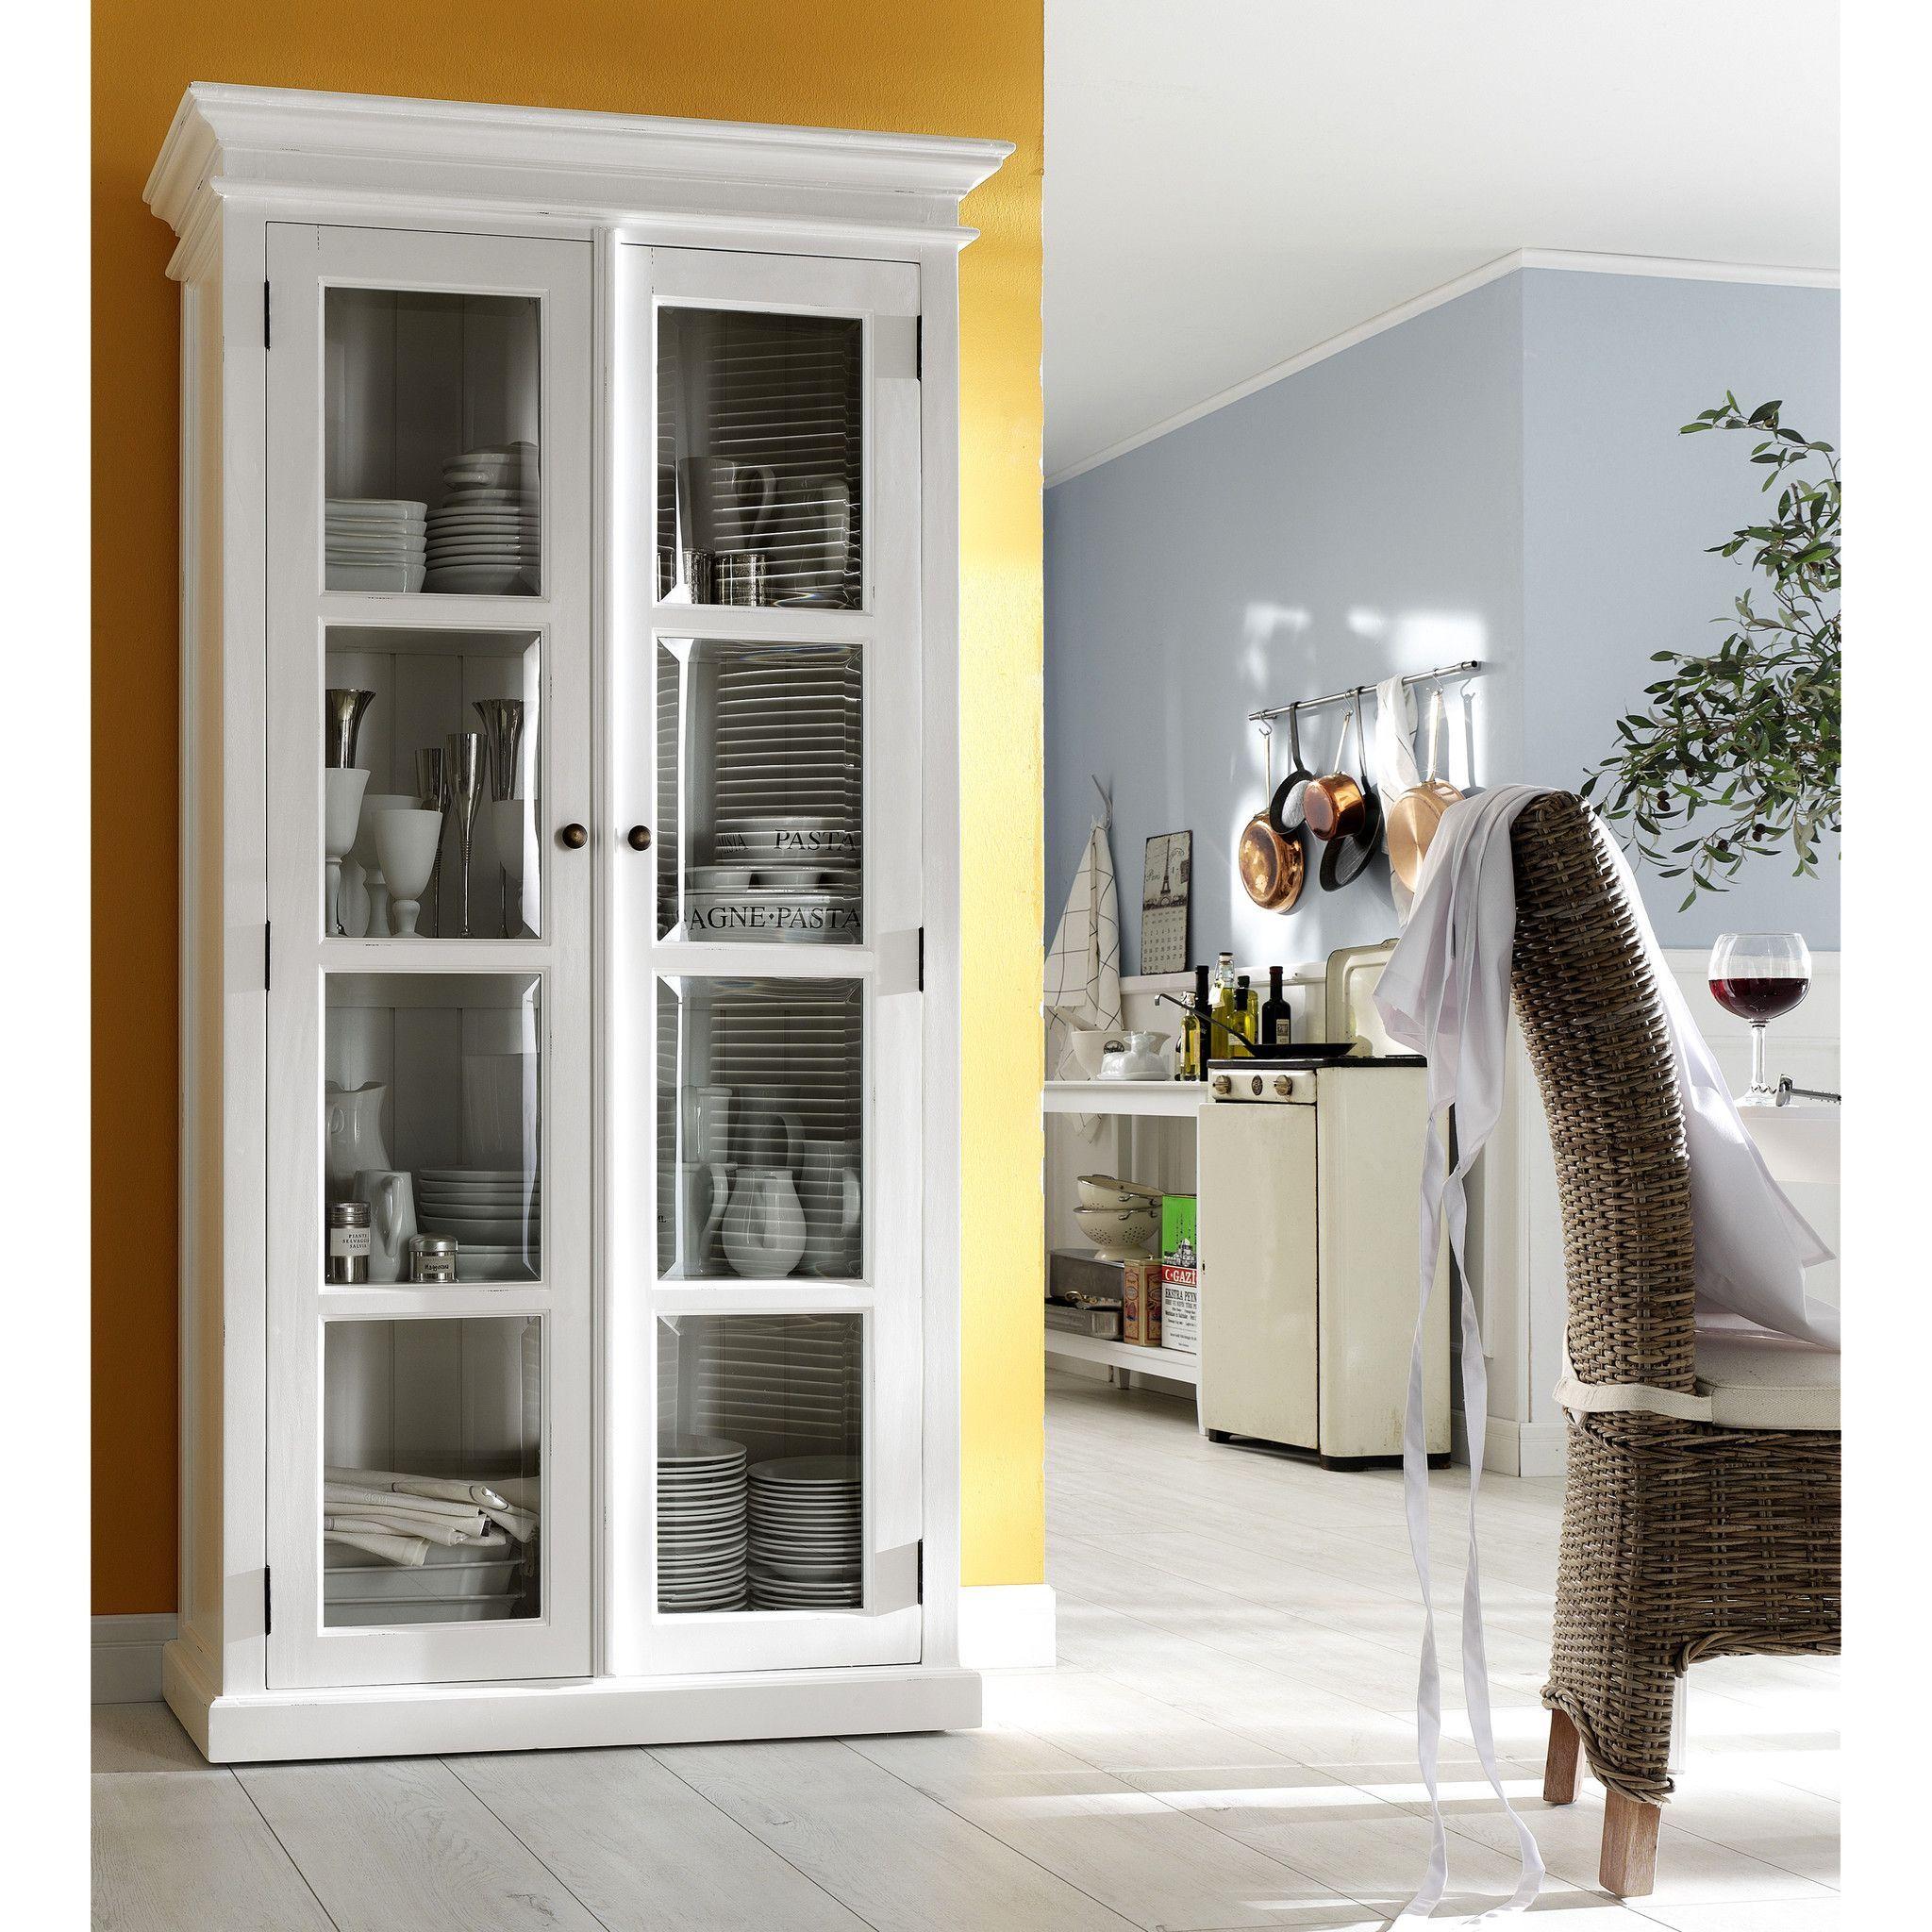 Great Danish Furniture | Double Glass Door Mahogany Armoire / Vitrine. | H12703